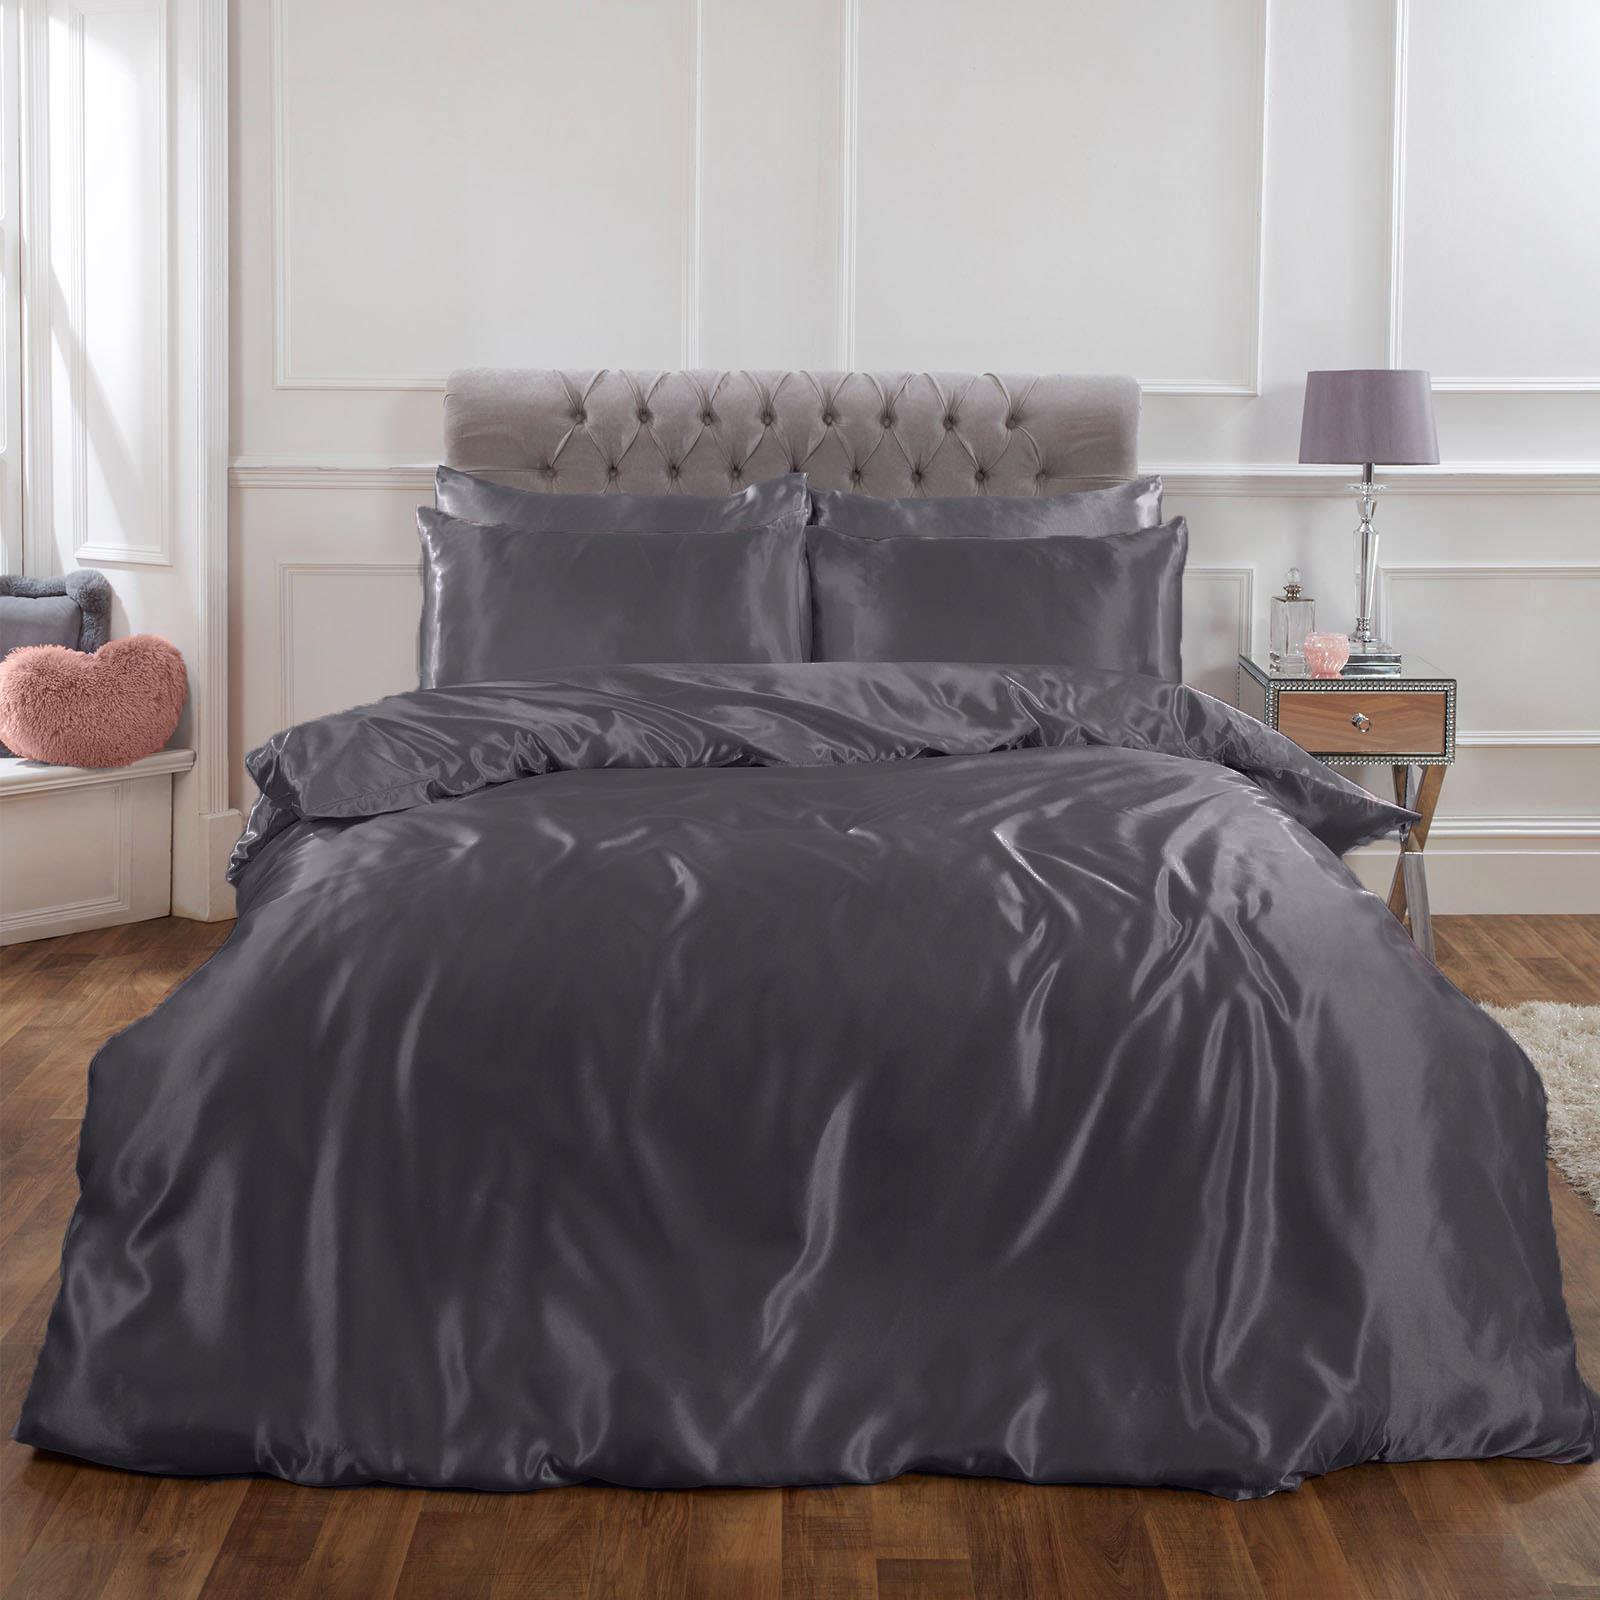 thumbnail 8 - Sienna Satin Silk Duvet Cover with Pillowcases Bedding Set, Blush Pink Silver